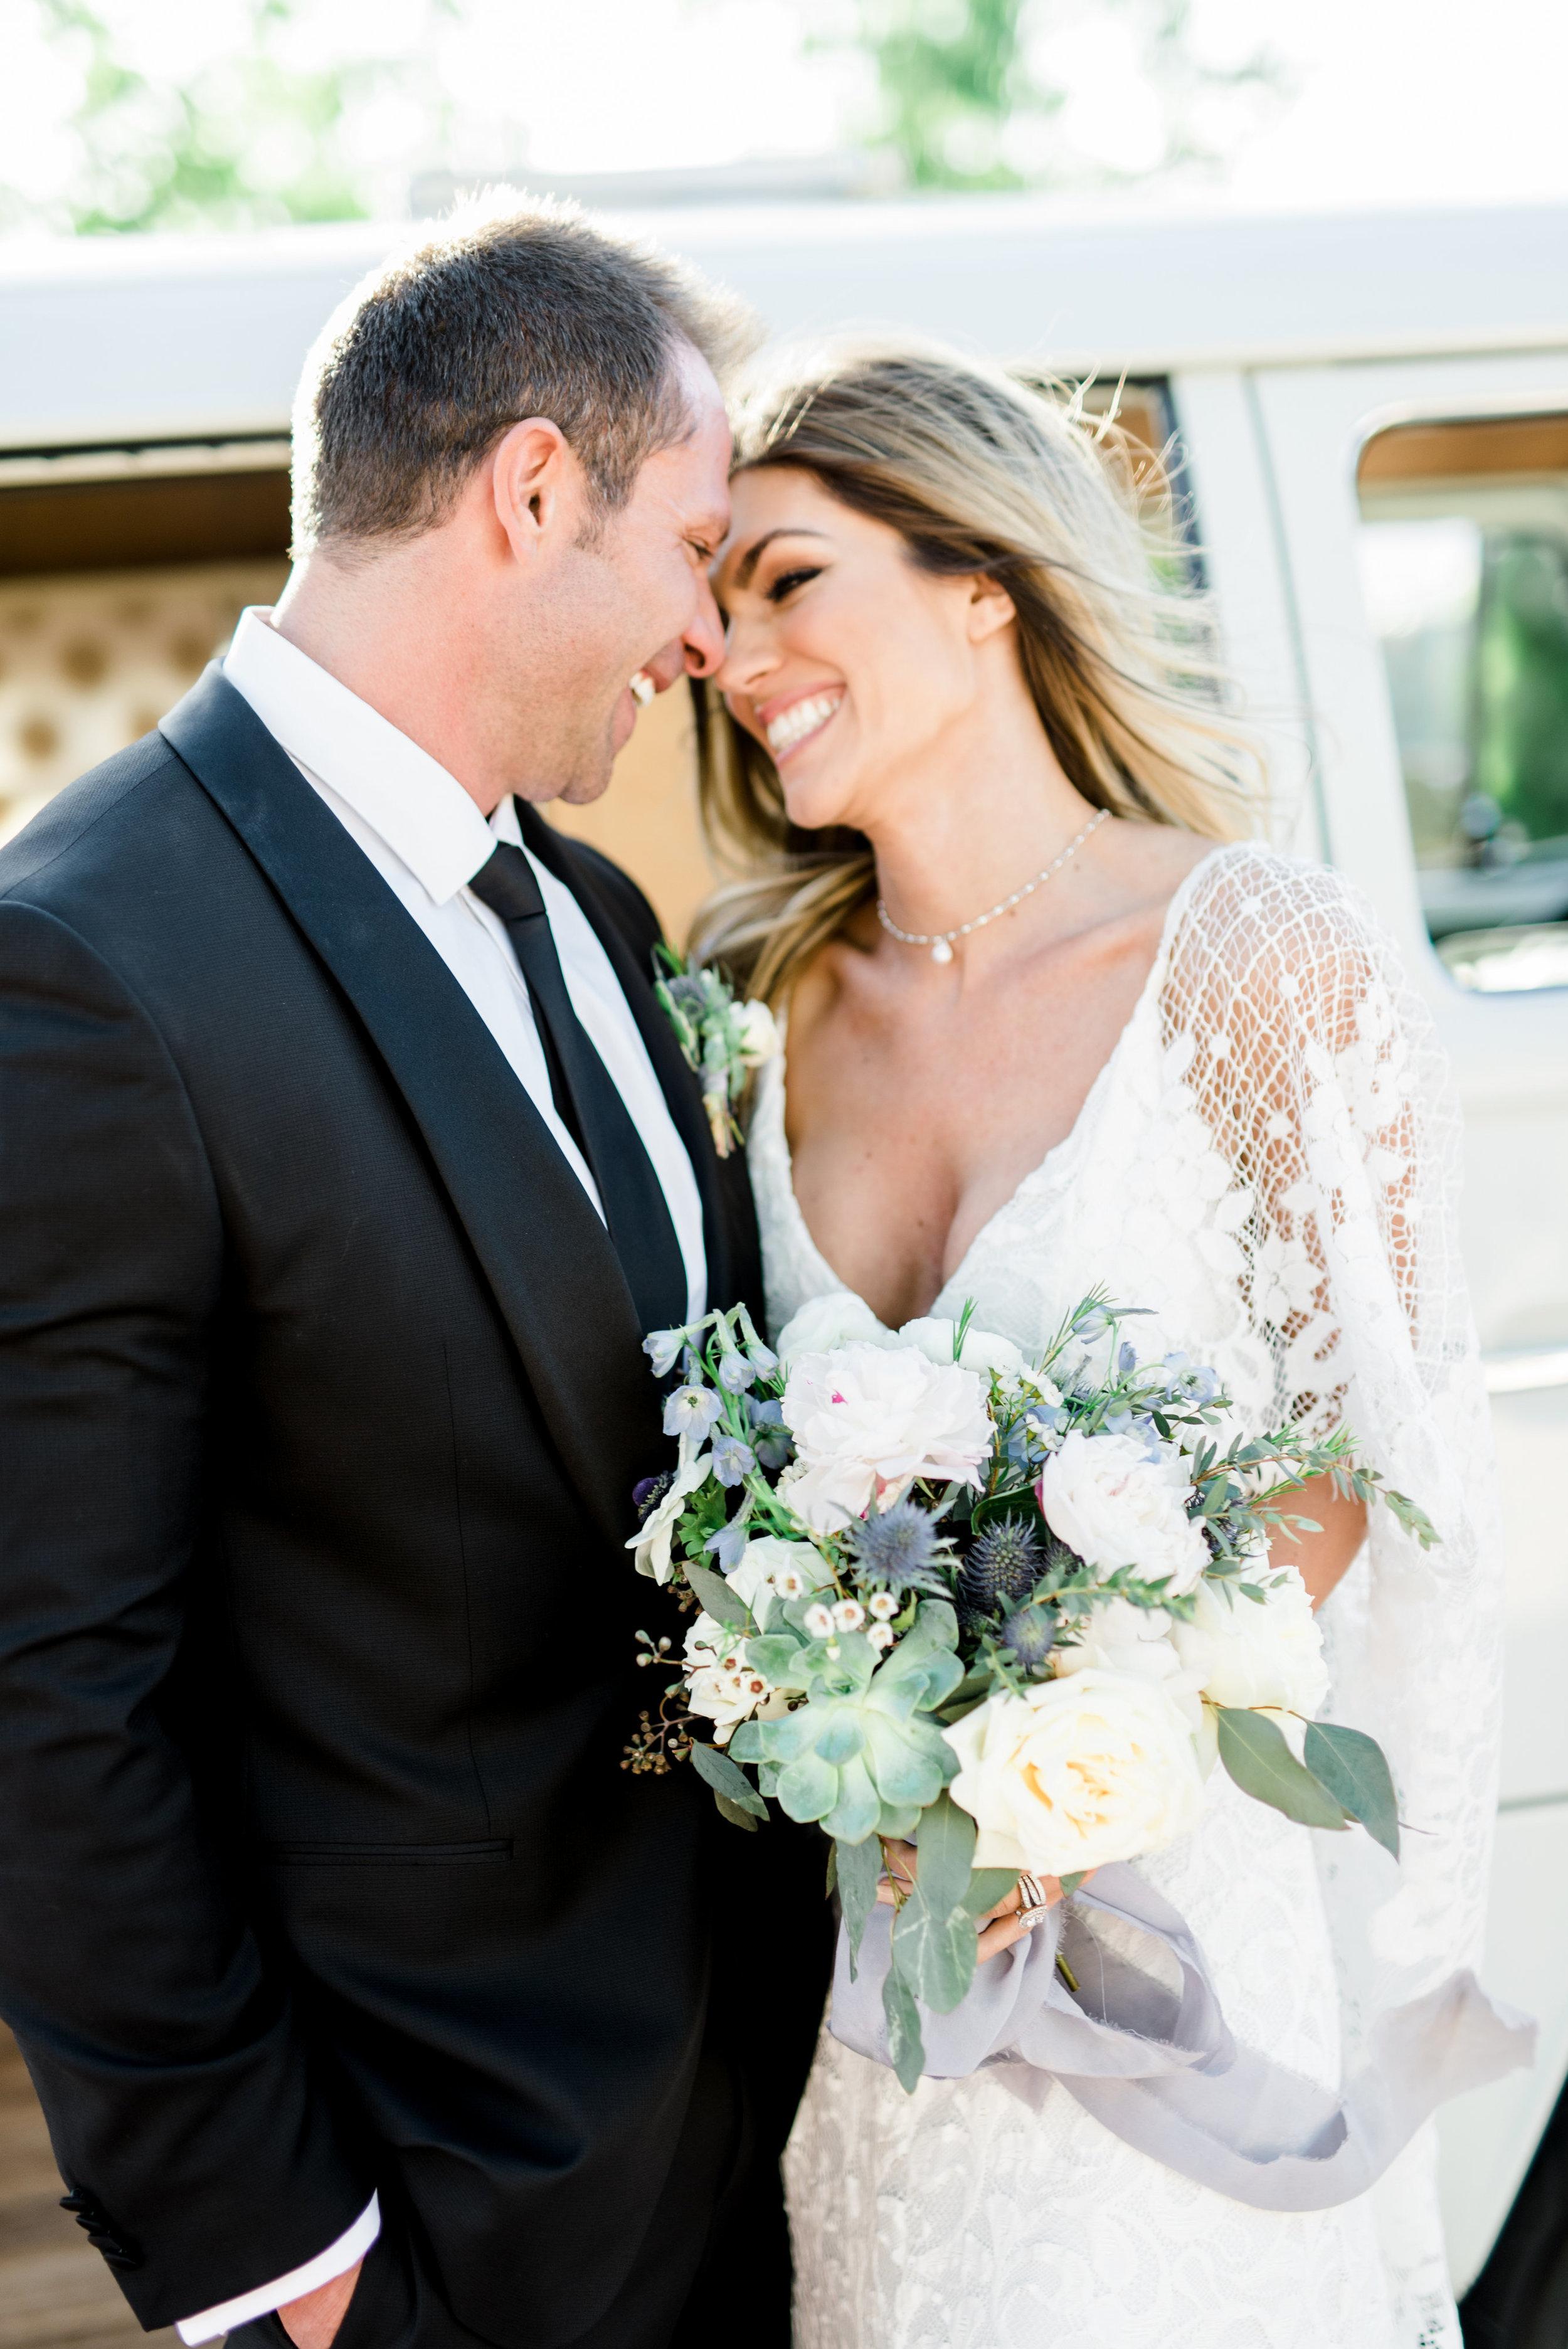 Boho Sedona Wedding - Succulent Bouquet